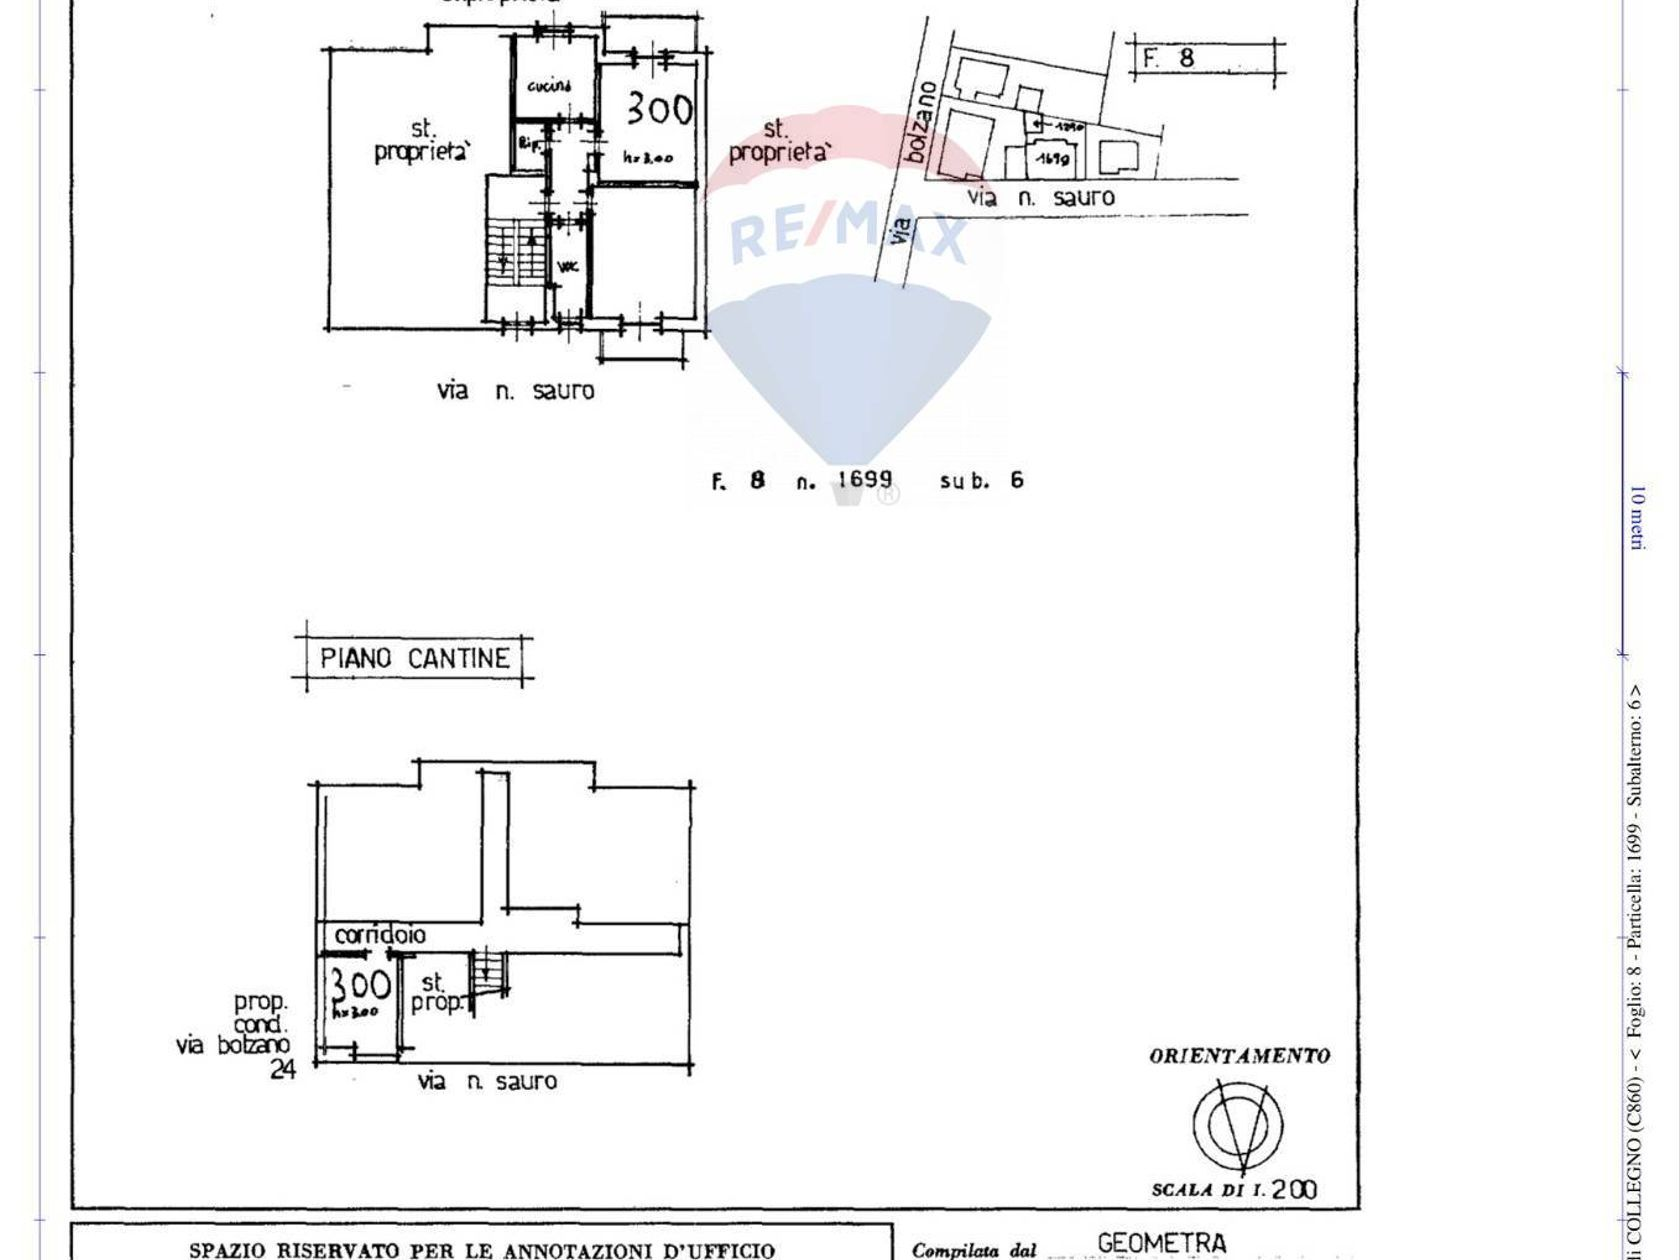 Casa Indipendente Santa Maria, Collegno, TO Vendita - Planimetria 4